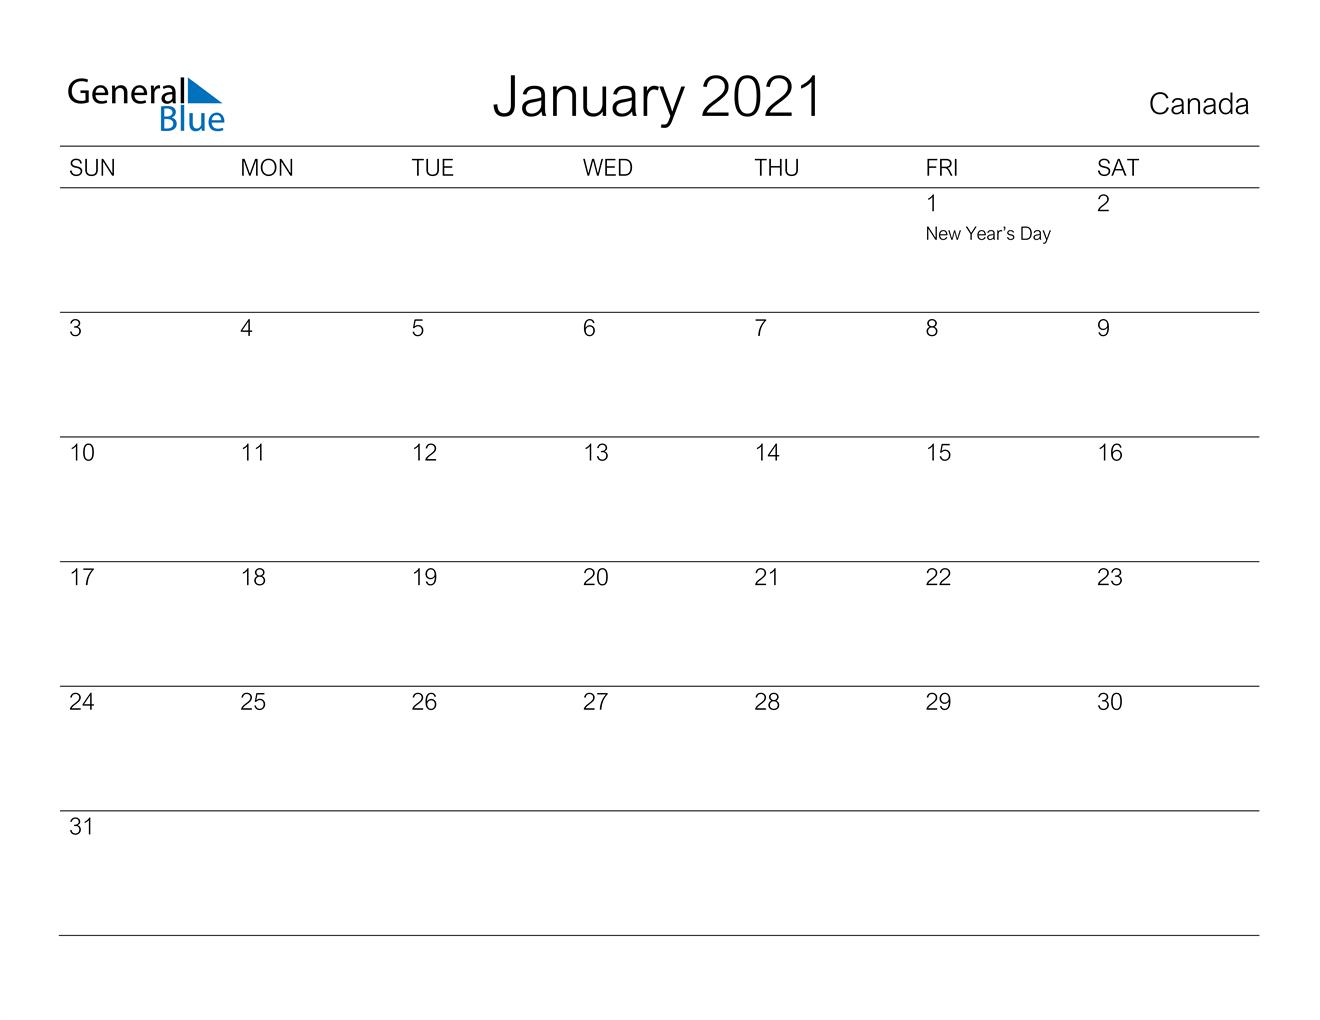 January 2021 Calendar - Canada